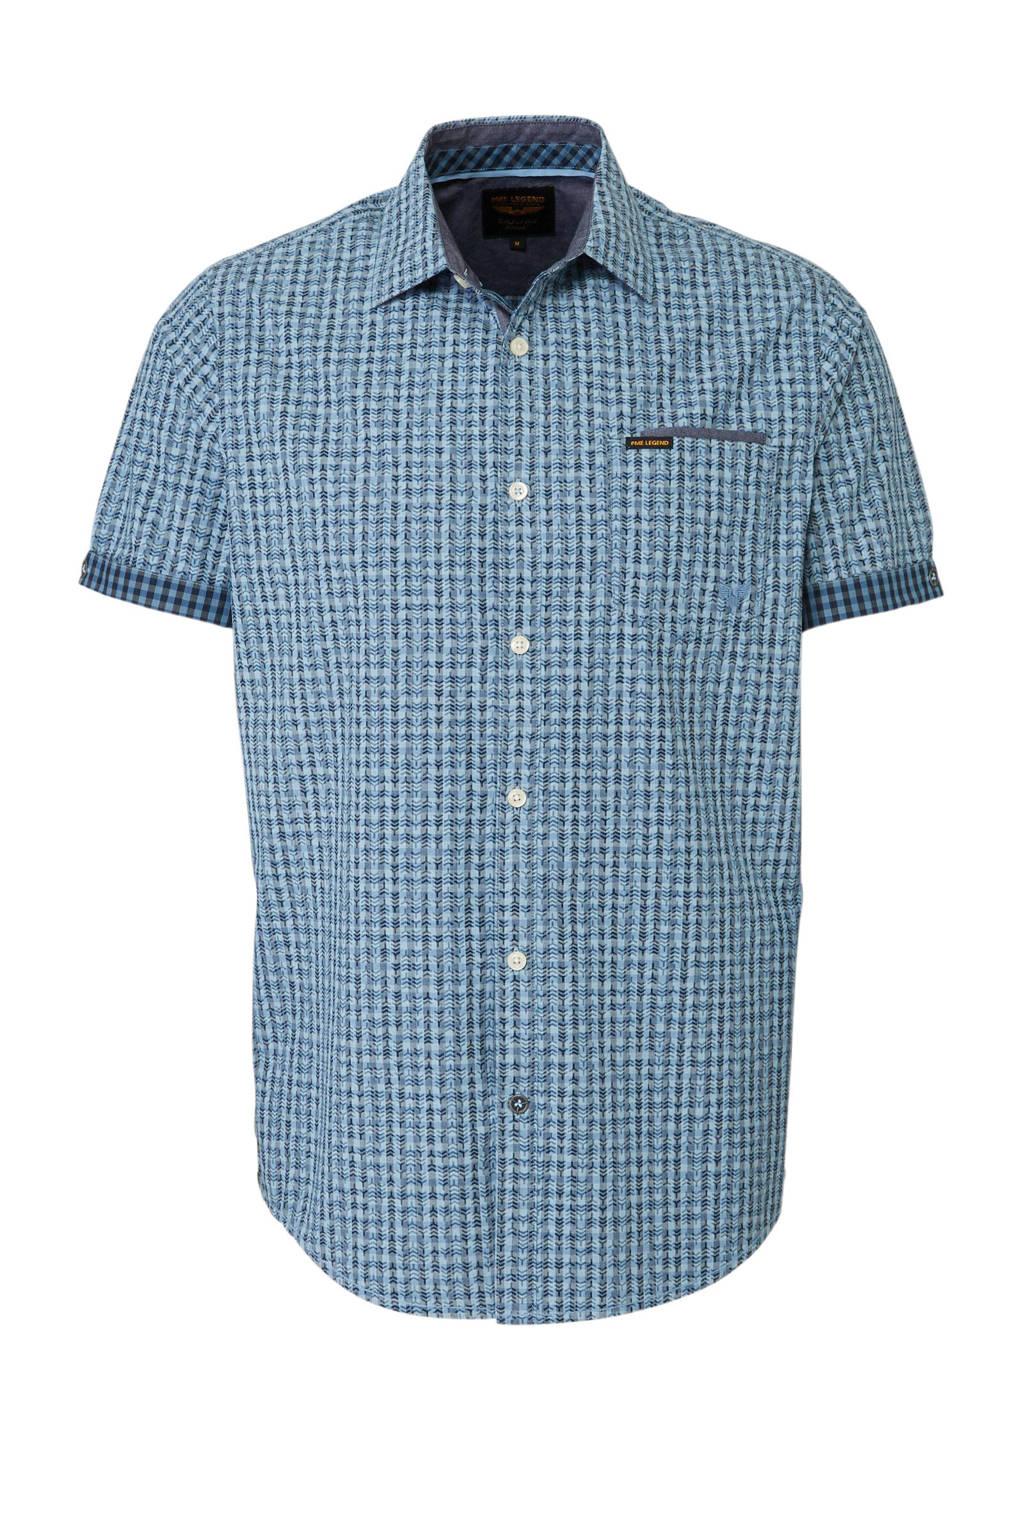 Overhemd Wit Korte Mouw.Pme Legend Overhemd Korte Mouw Wehkamp